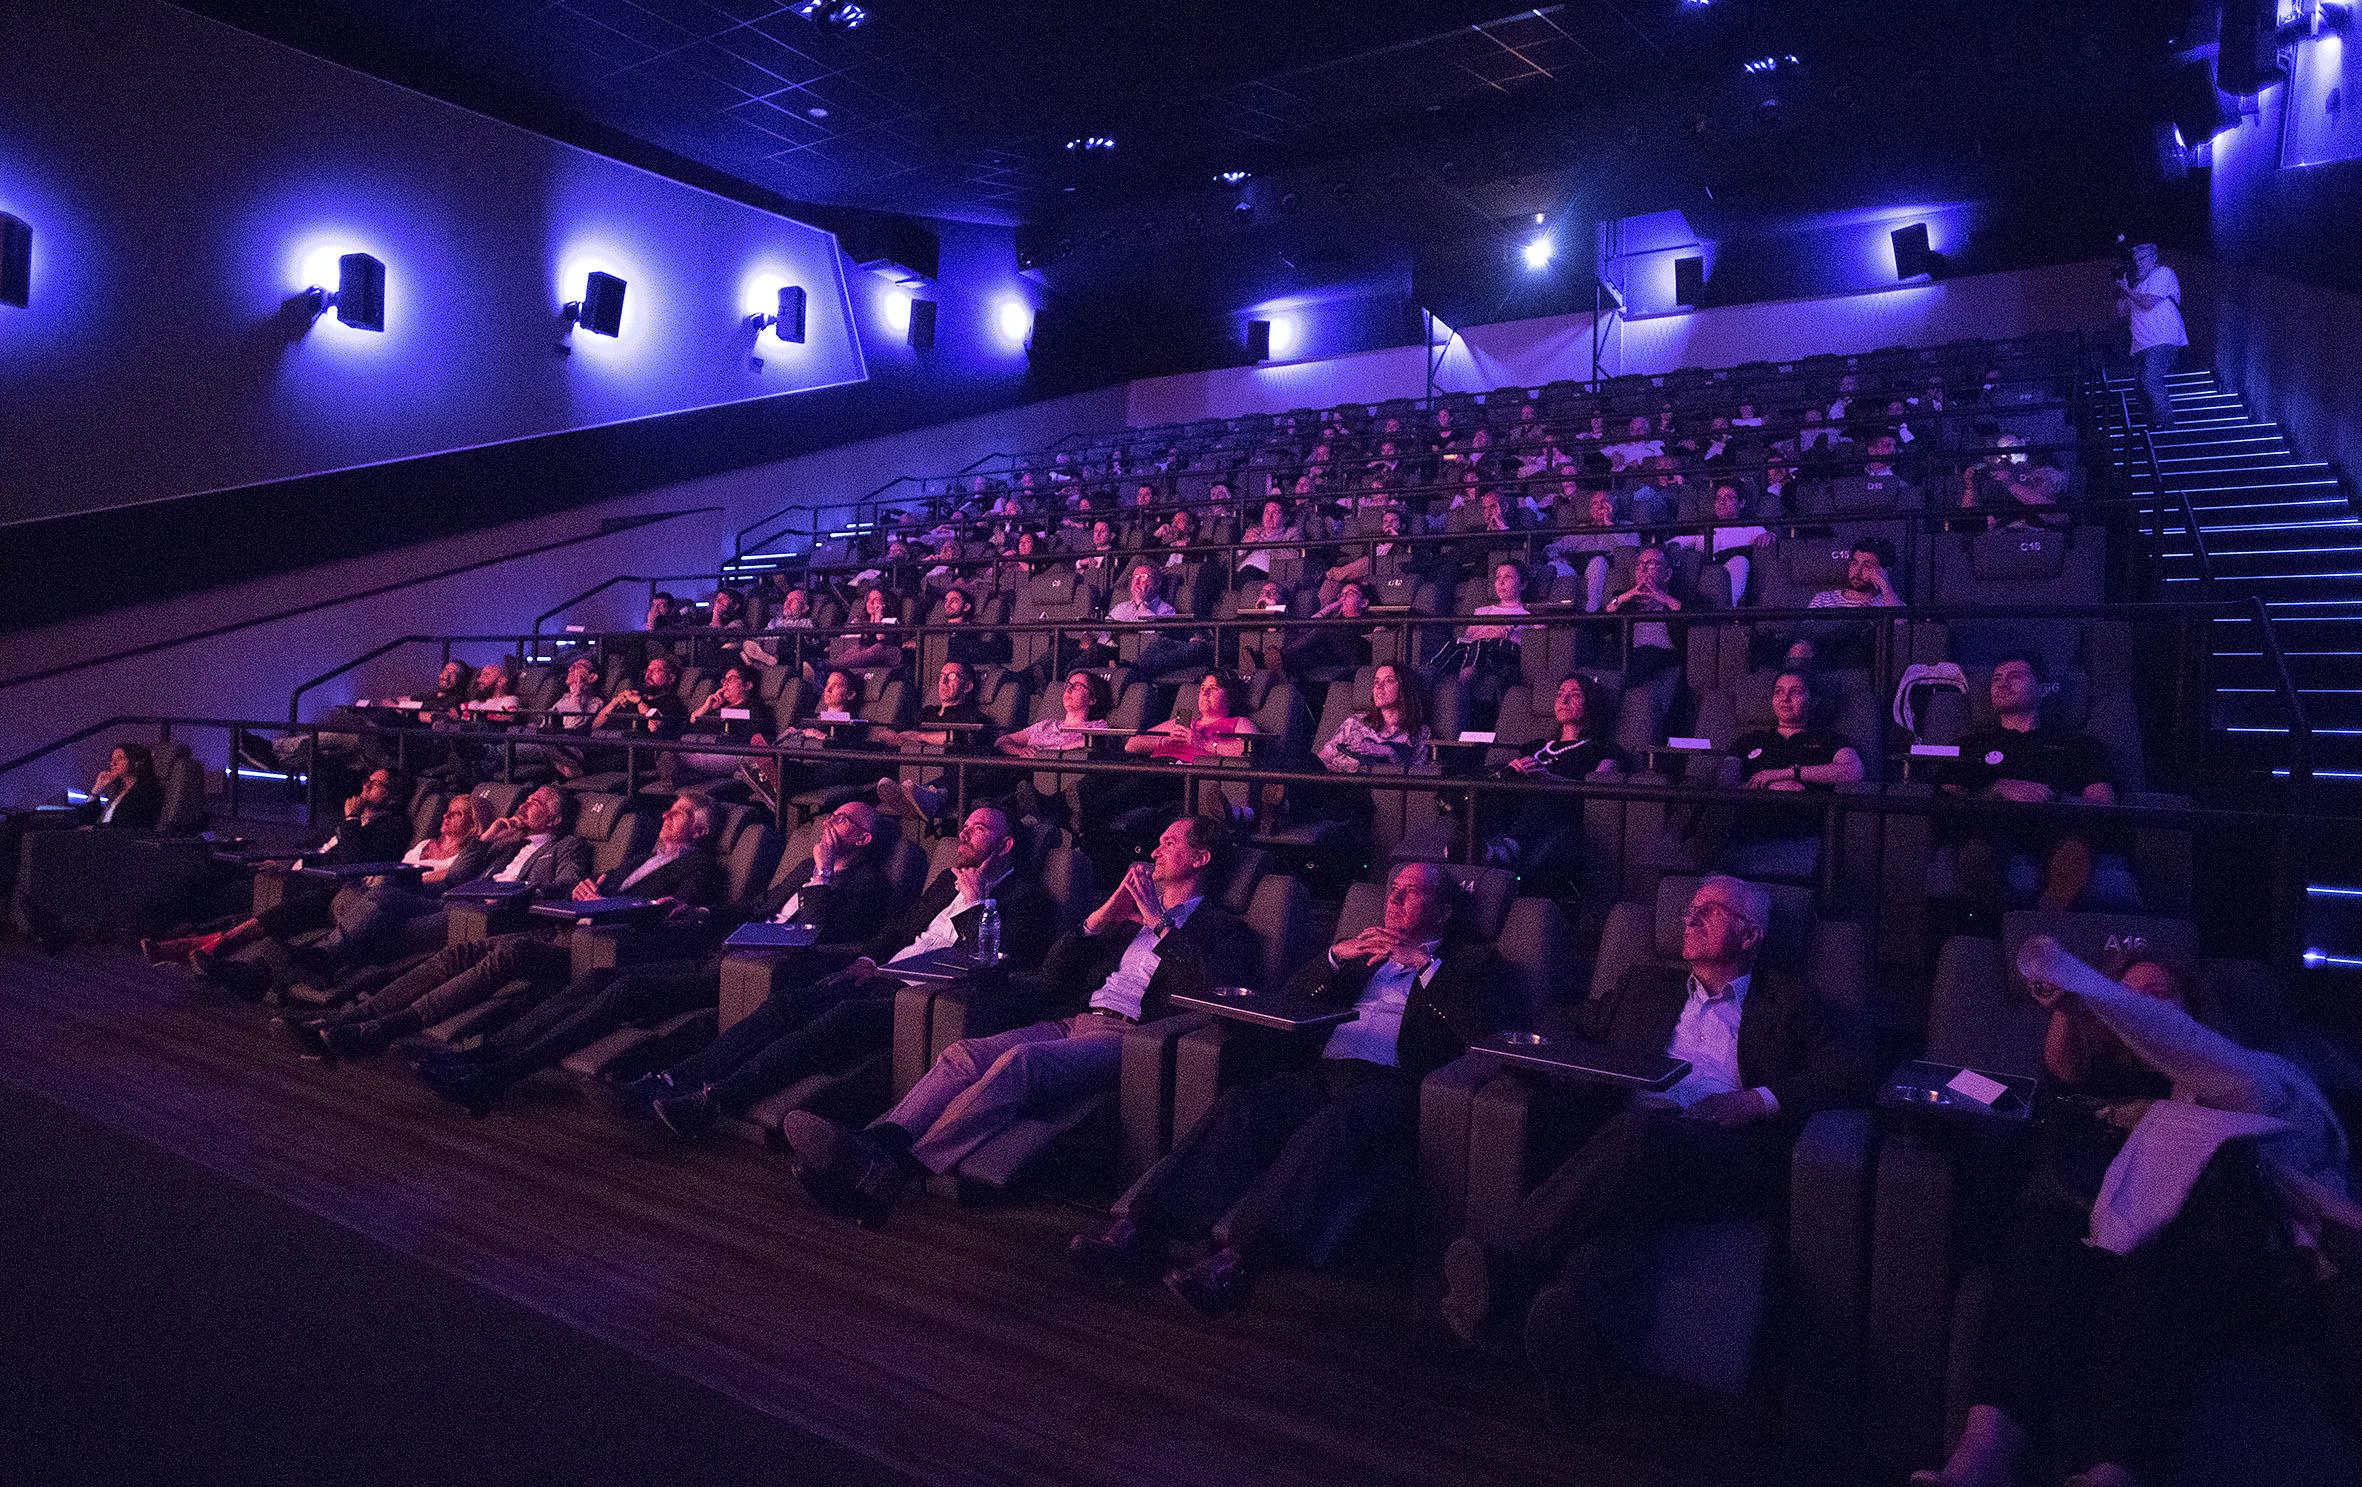 Carme Ripolles 31052019 Ocine cines estepark